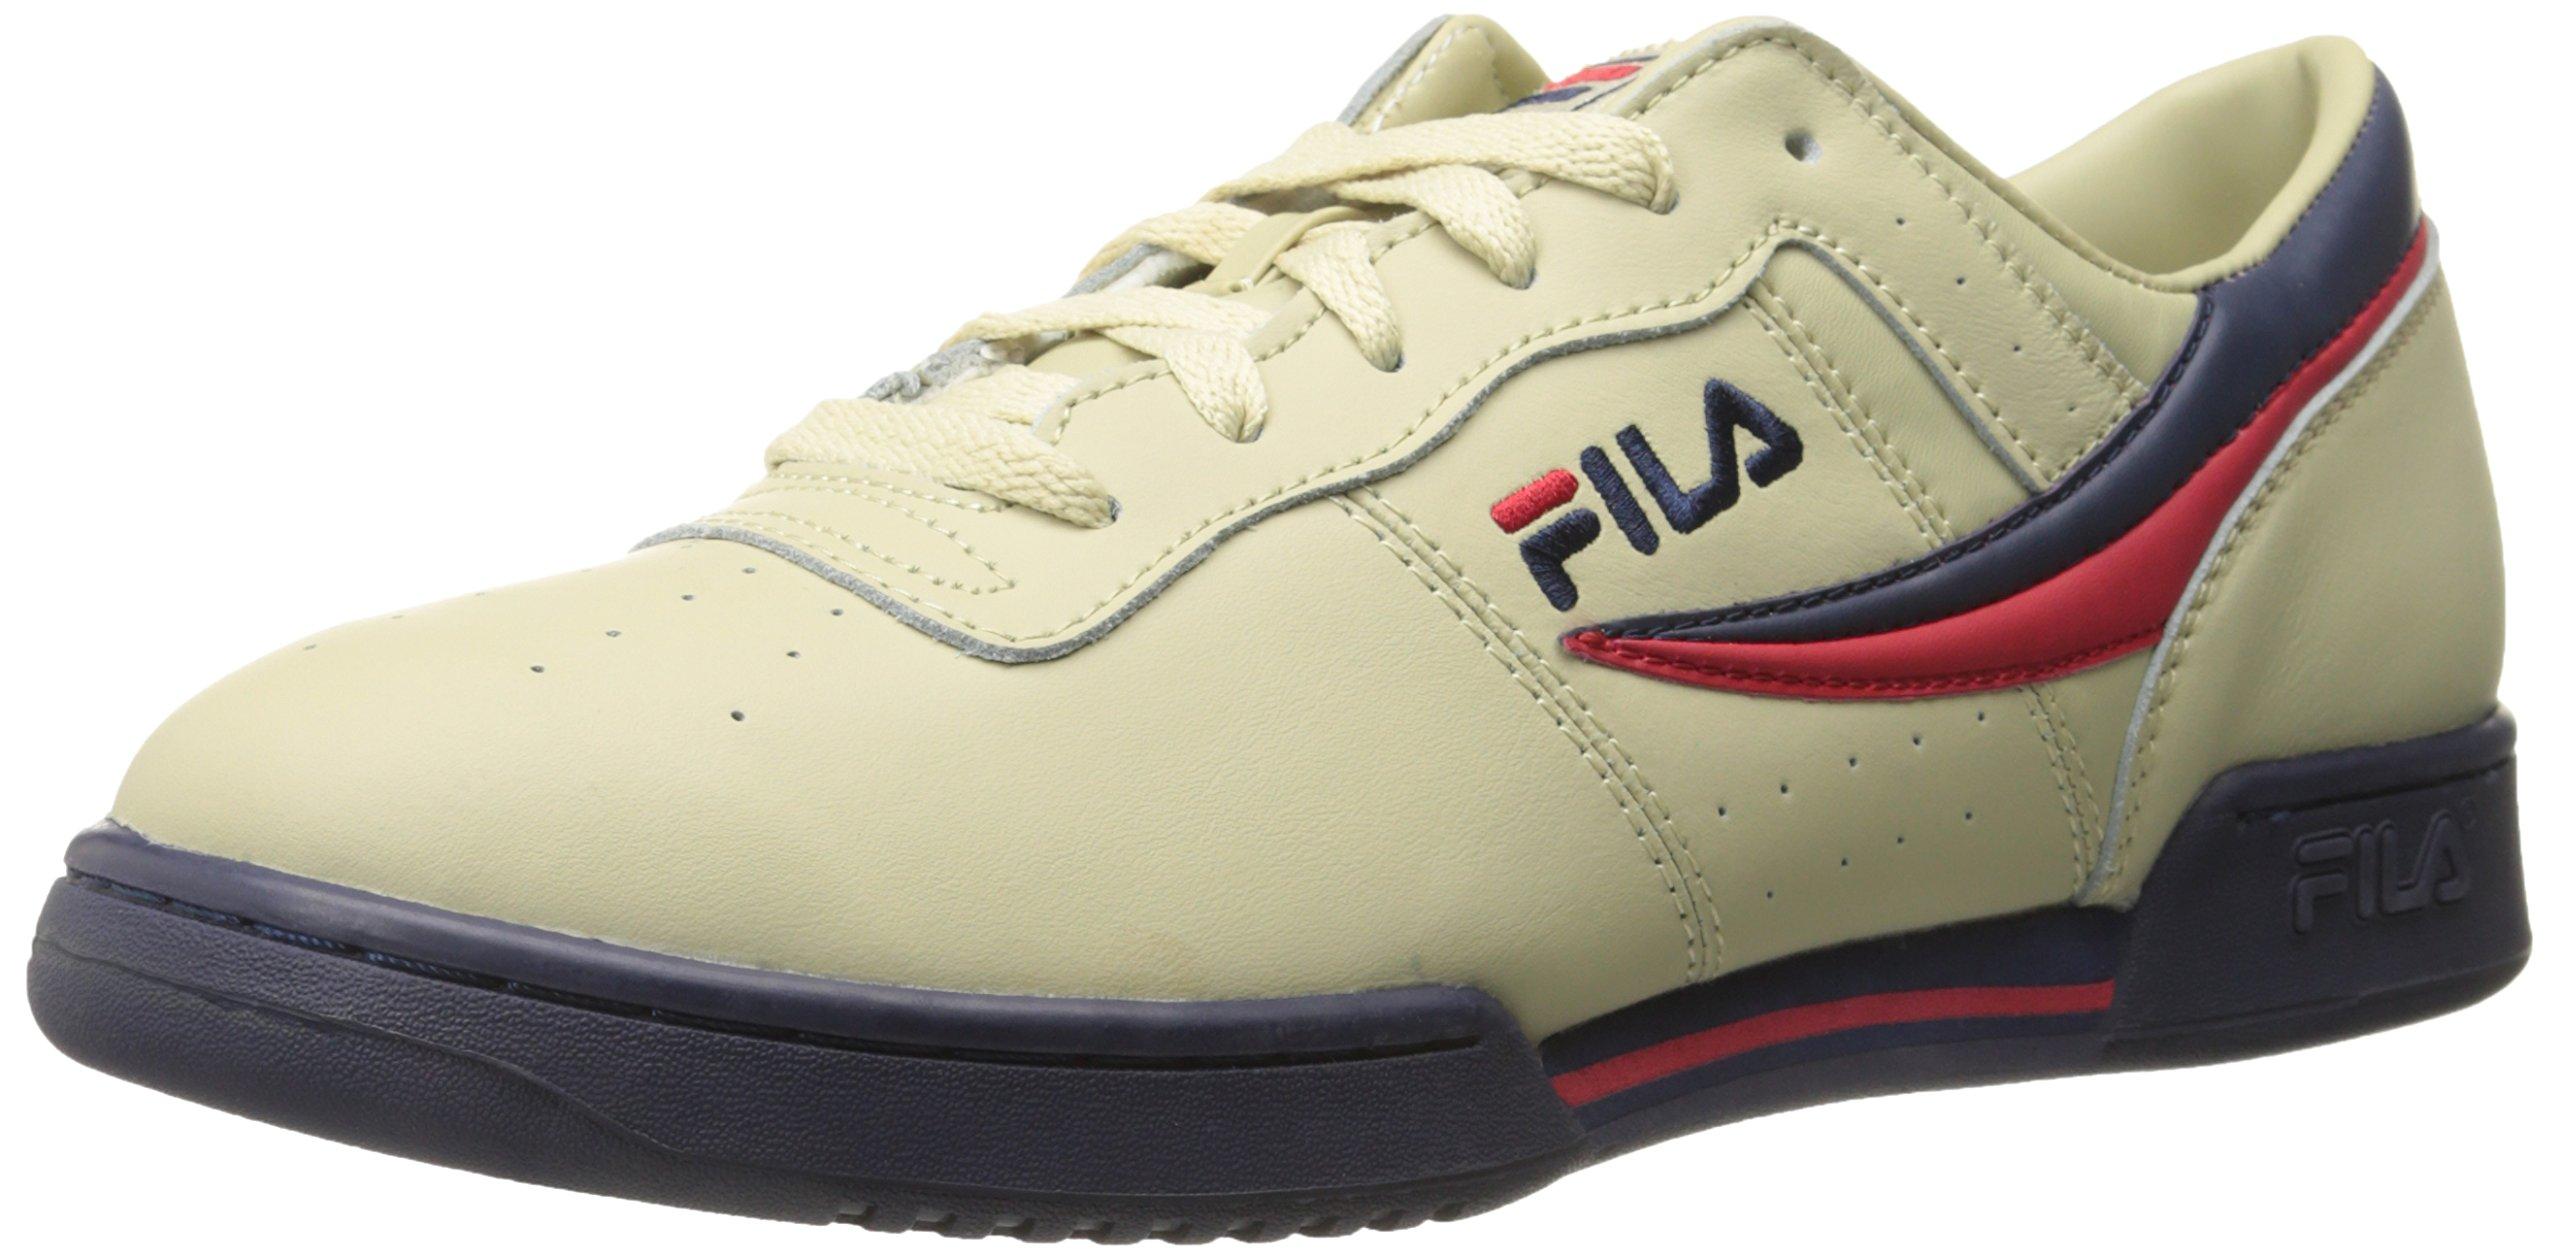 Fila Men's Original Fitness Fashion Sneaker, Cream/Peacoat Red, 8 M US